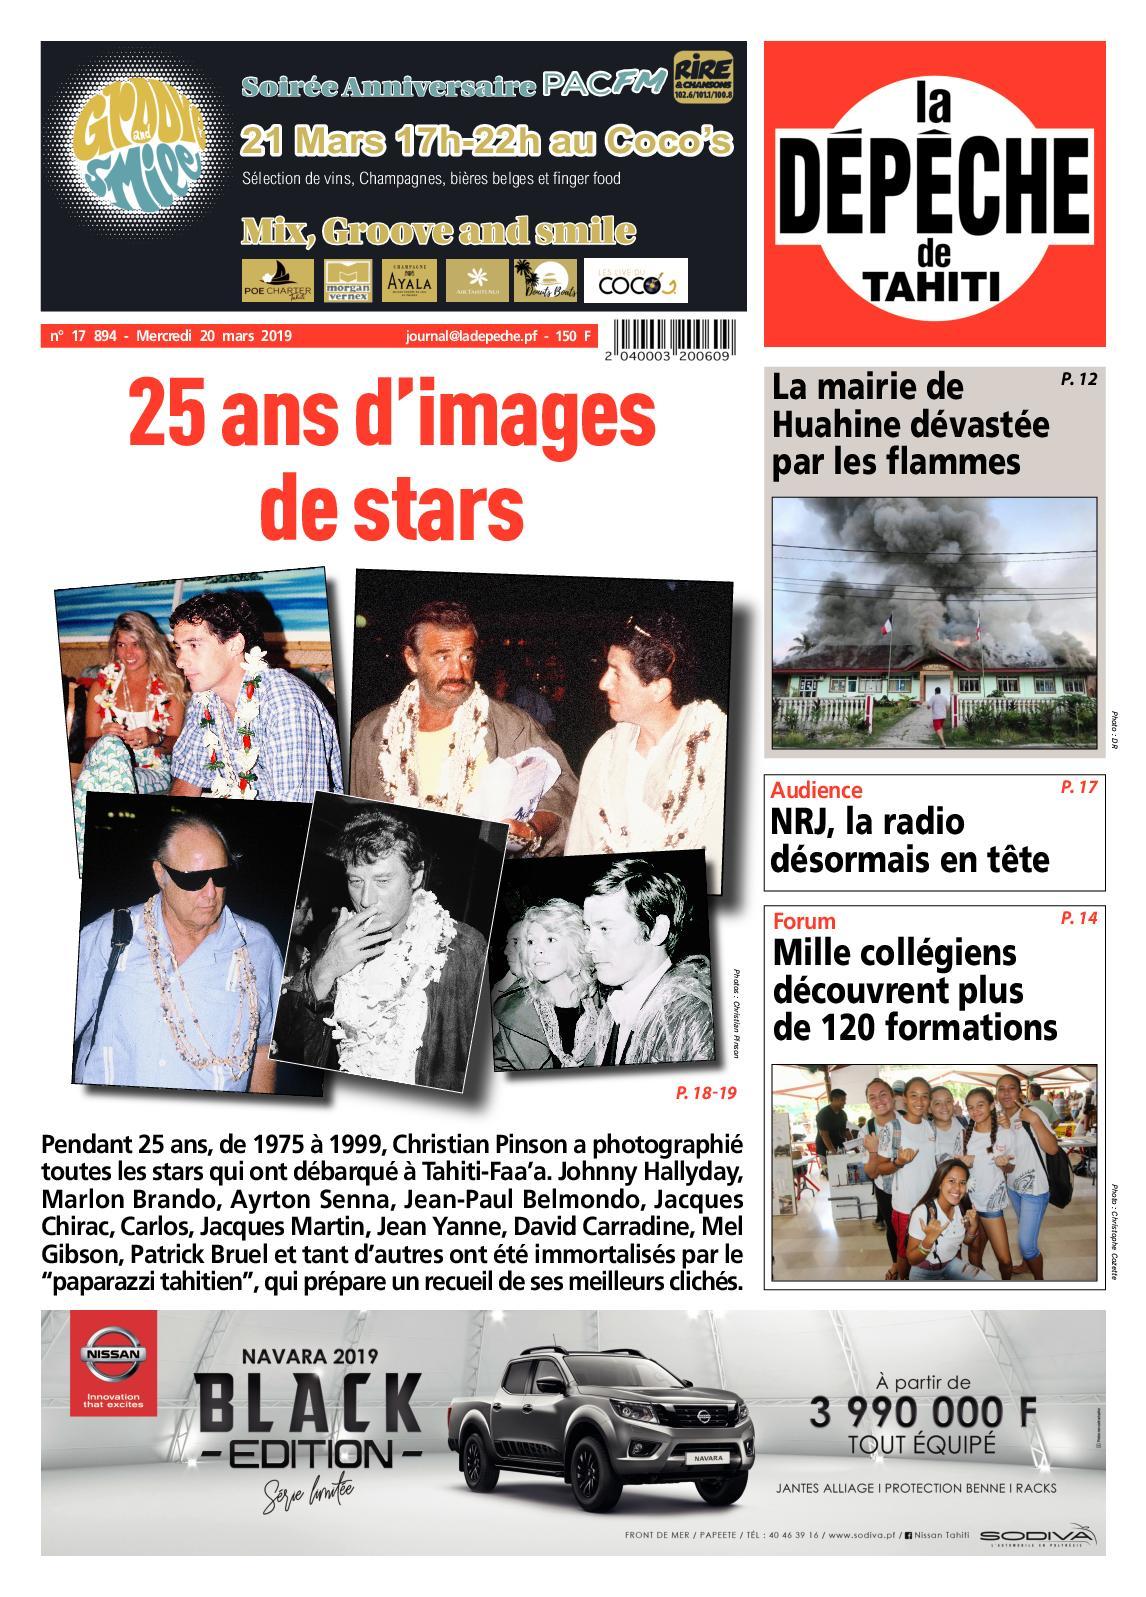 La Dépêche de Tahiti N° 17894 du 20 mars 2019